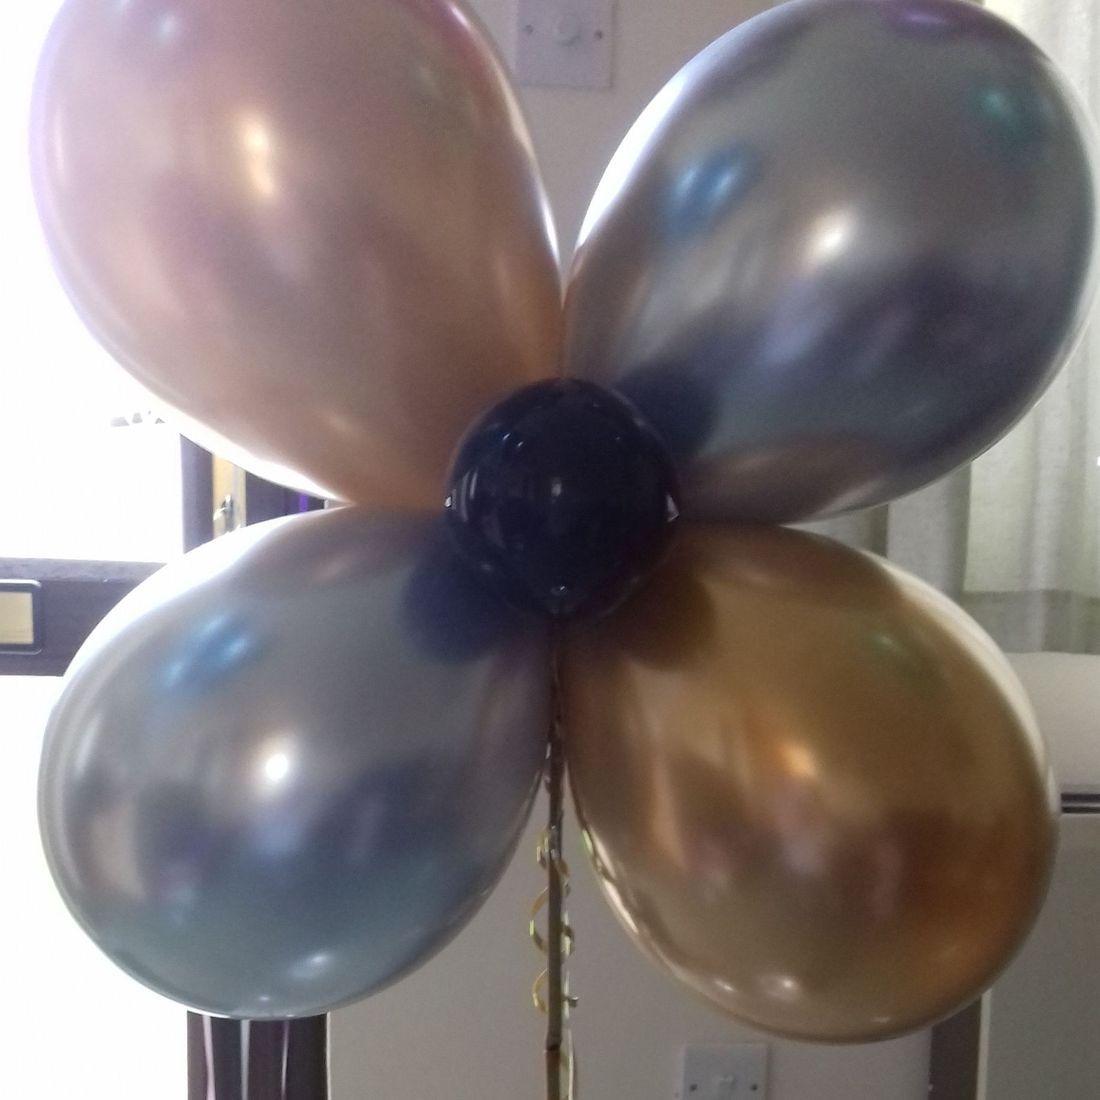 Chrome balloons